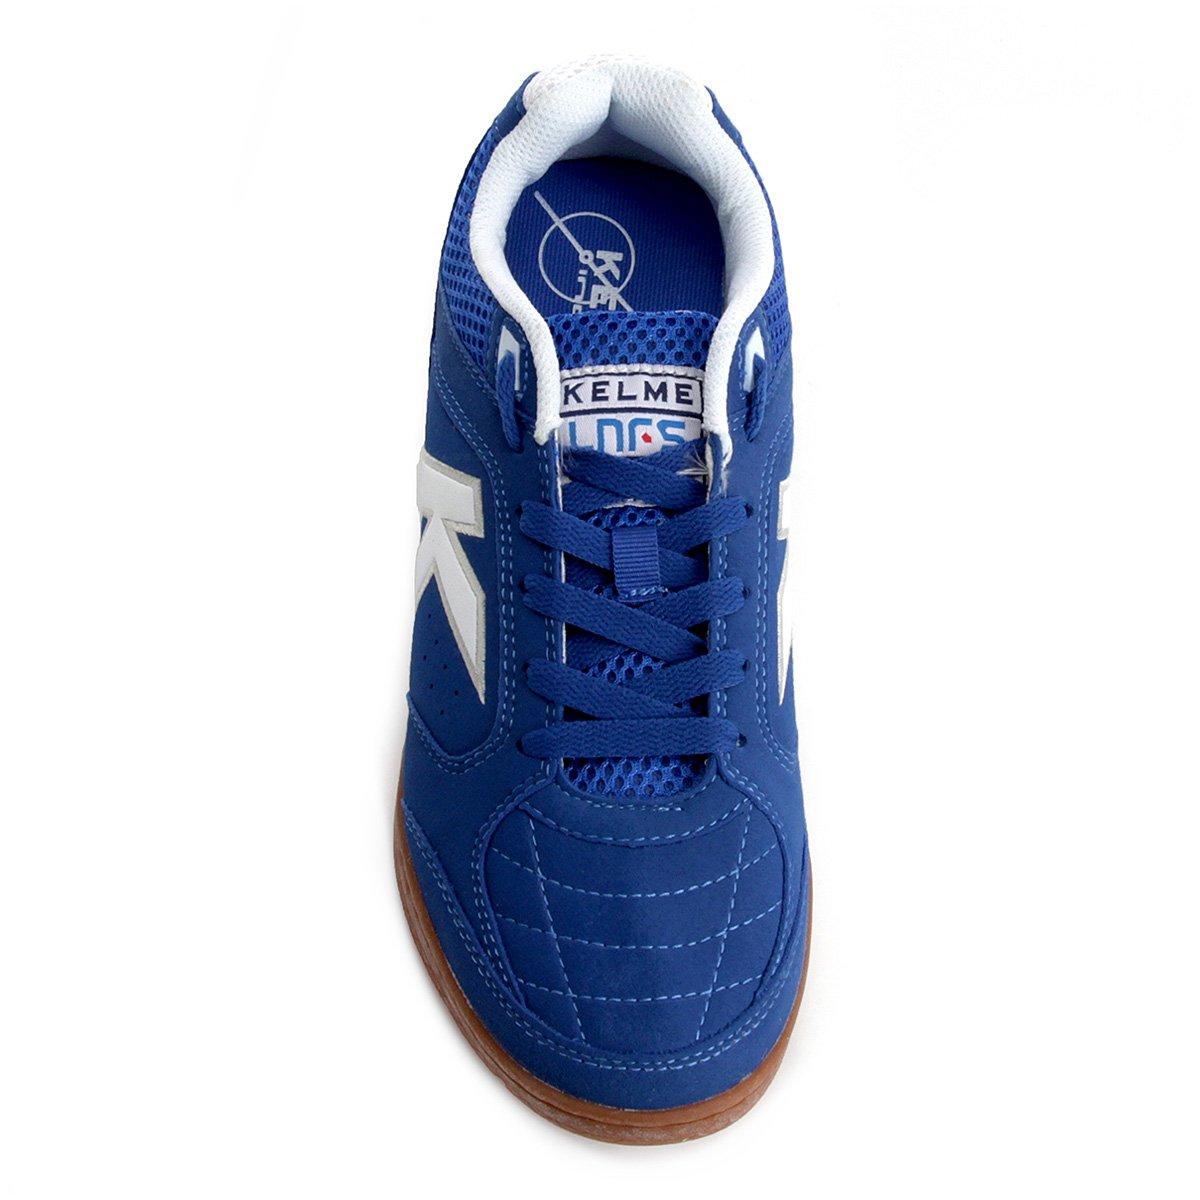 Azul Precision e Kelme Futsal Chuteira Futsal Branco Masculina Chuteira Lnfs 8qTR0WIR